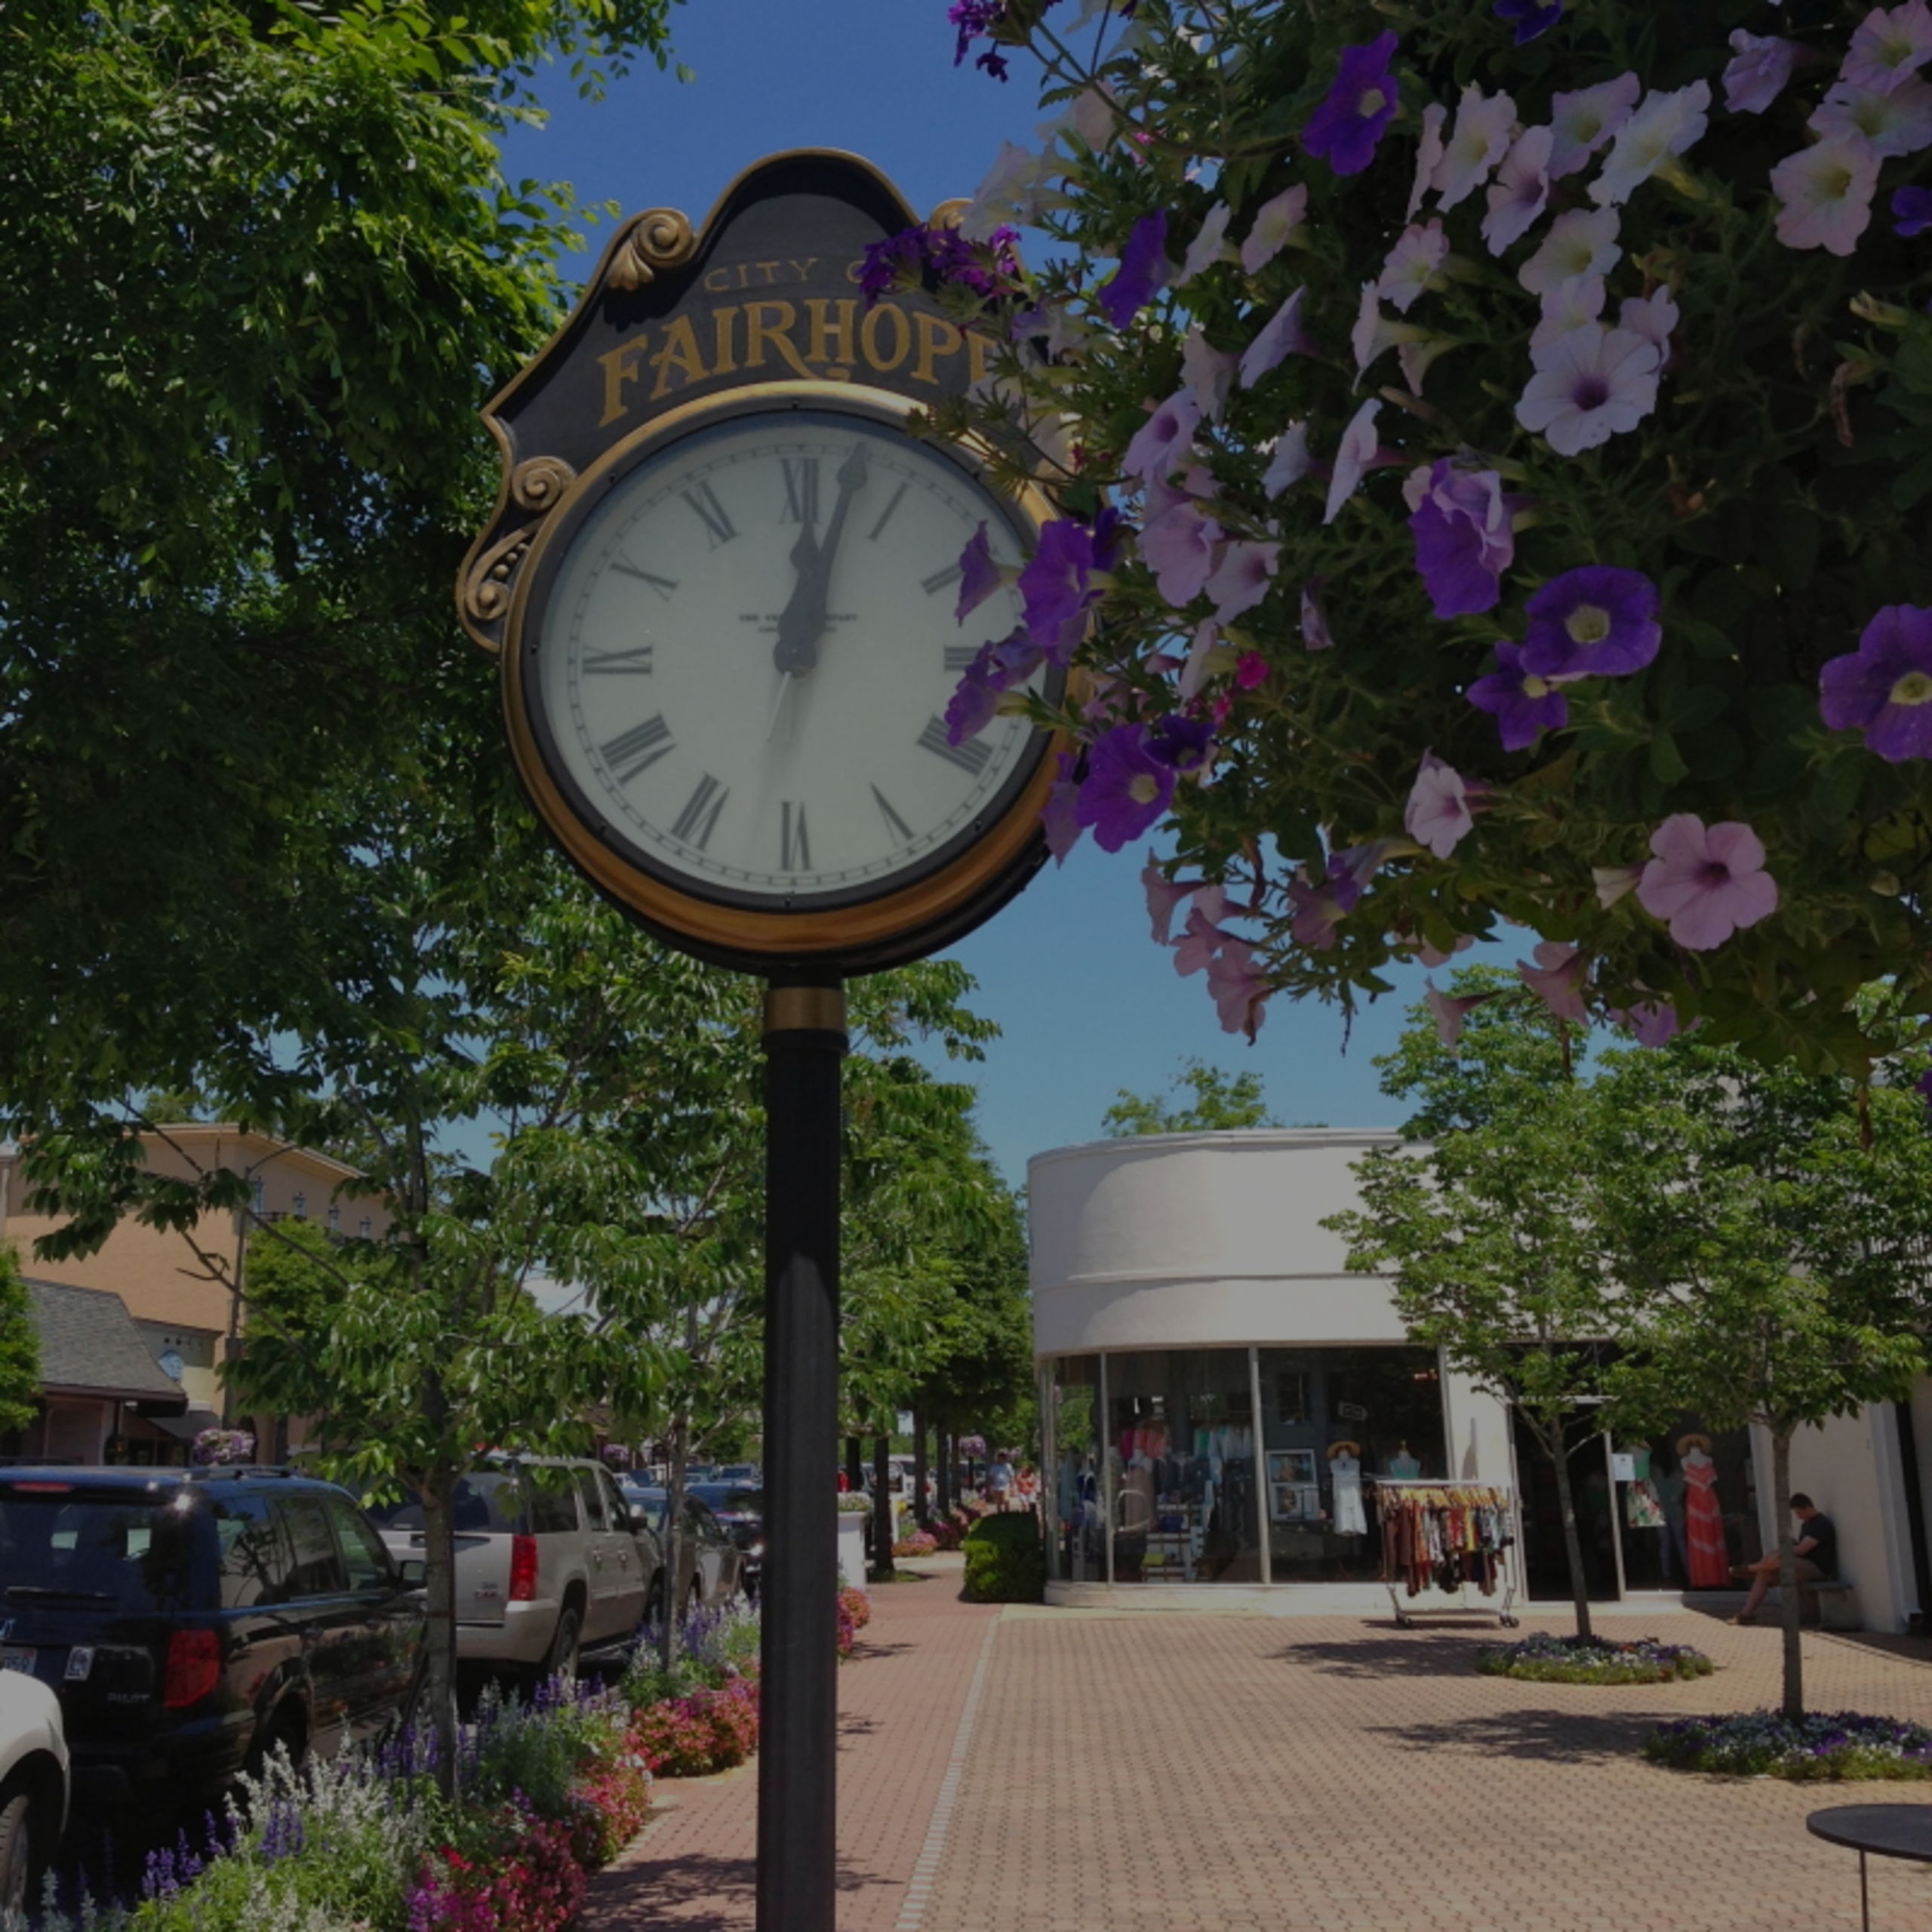 Downtown Fairhope